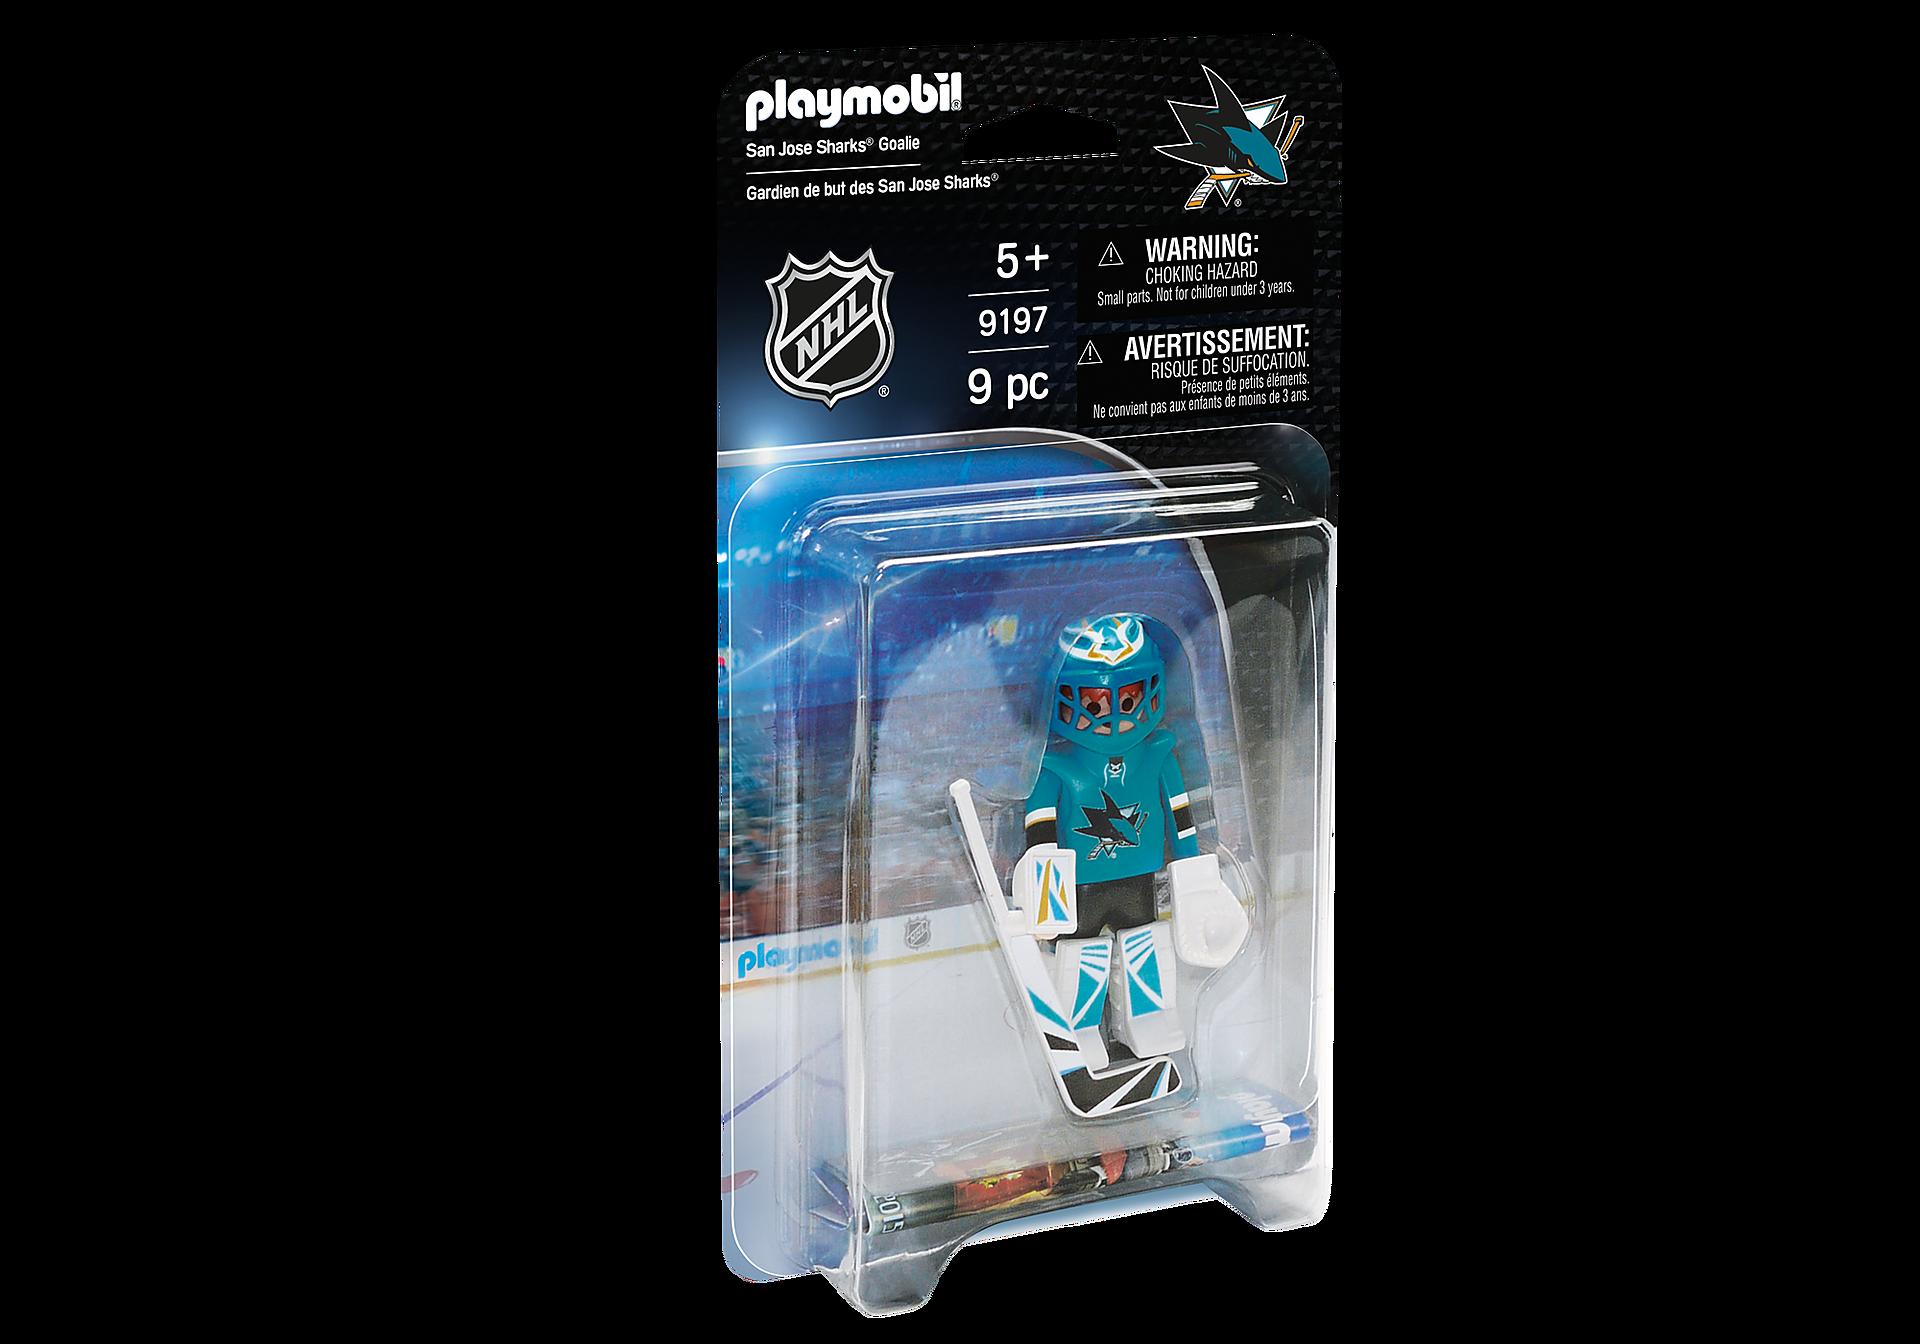 http://media.playmobil.com/i/playmobil/9197_product_box_front/NHL® San Jose Sharks® Goalie